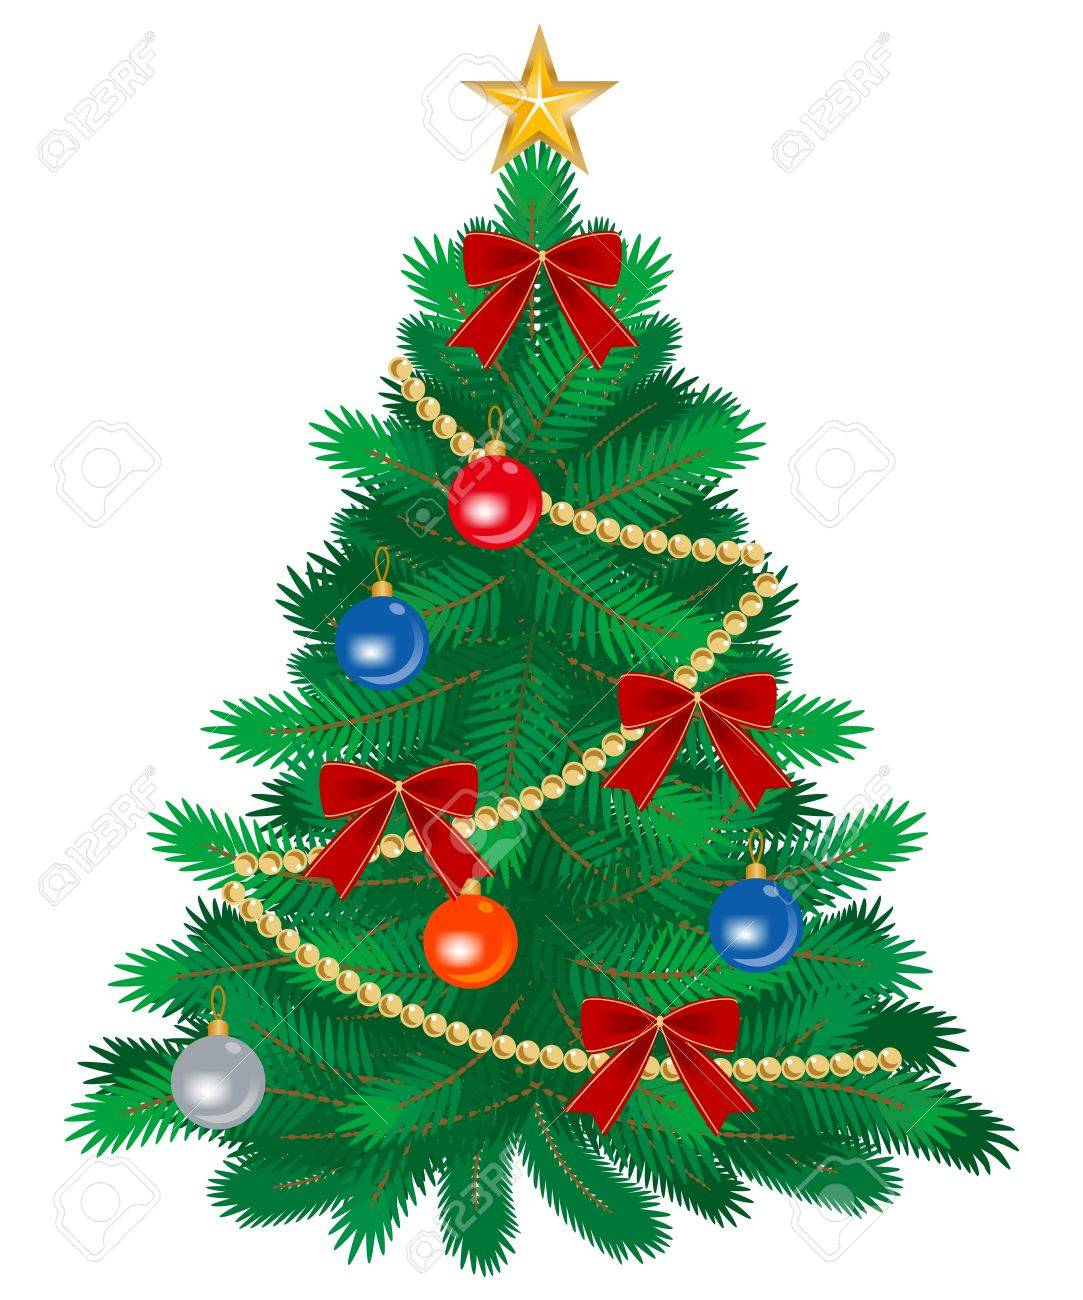 Christmas tree decoration - 15965587